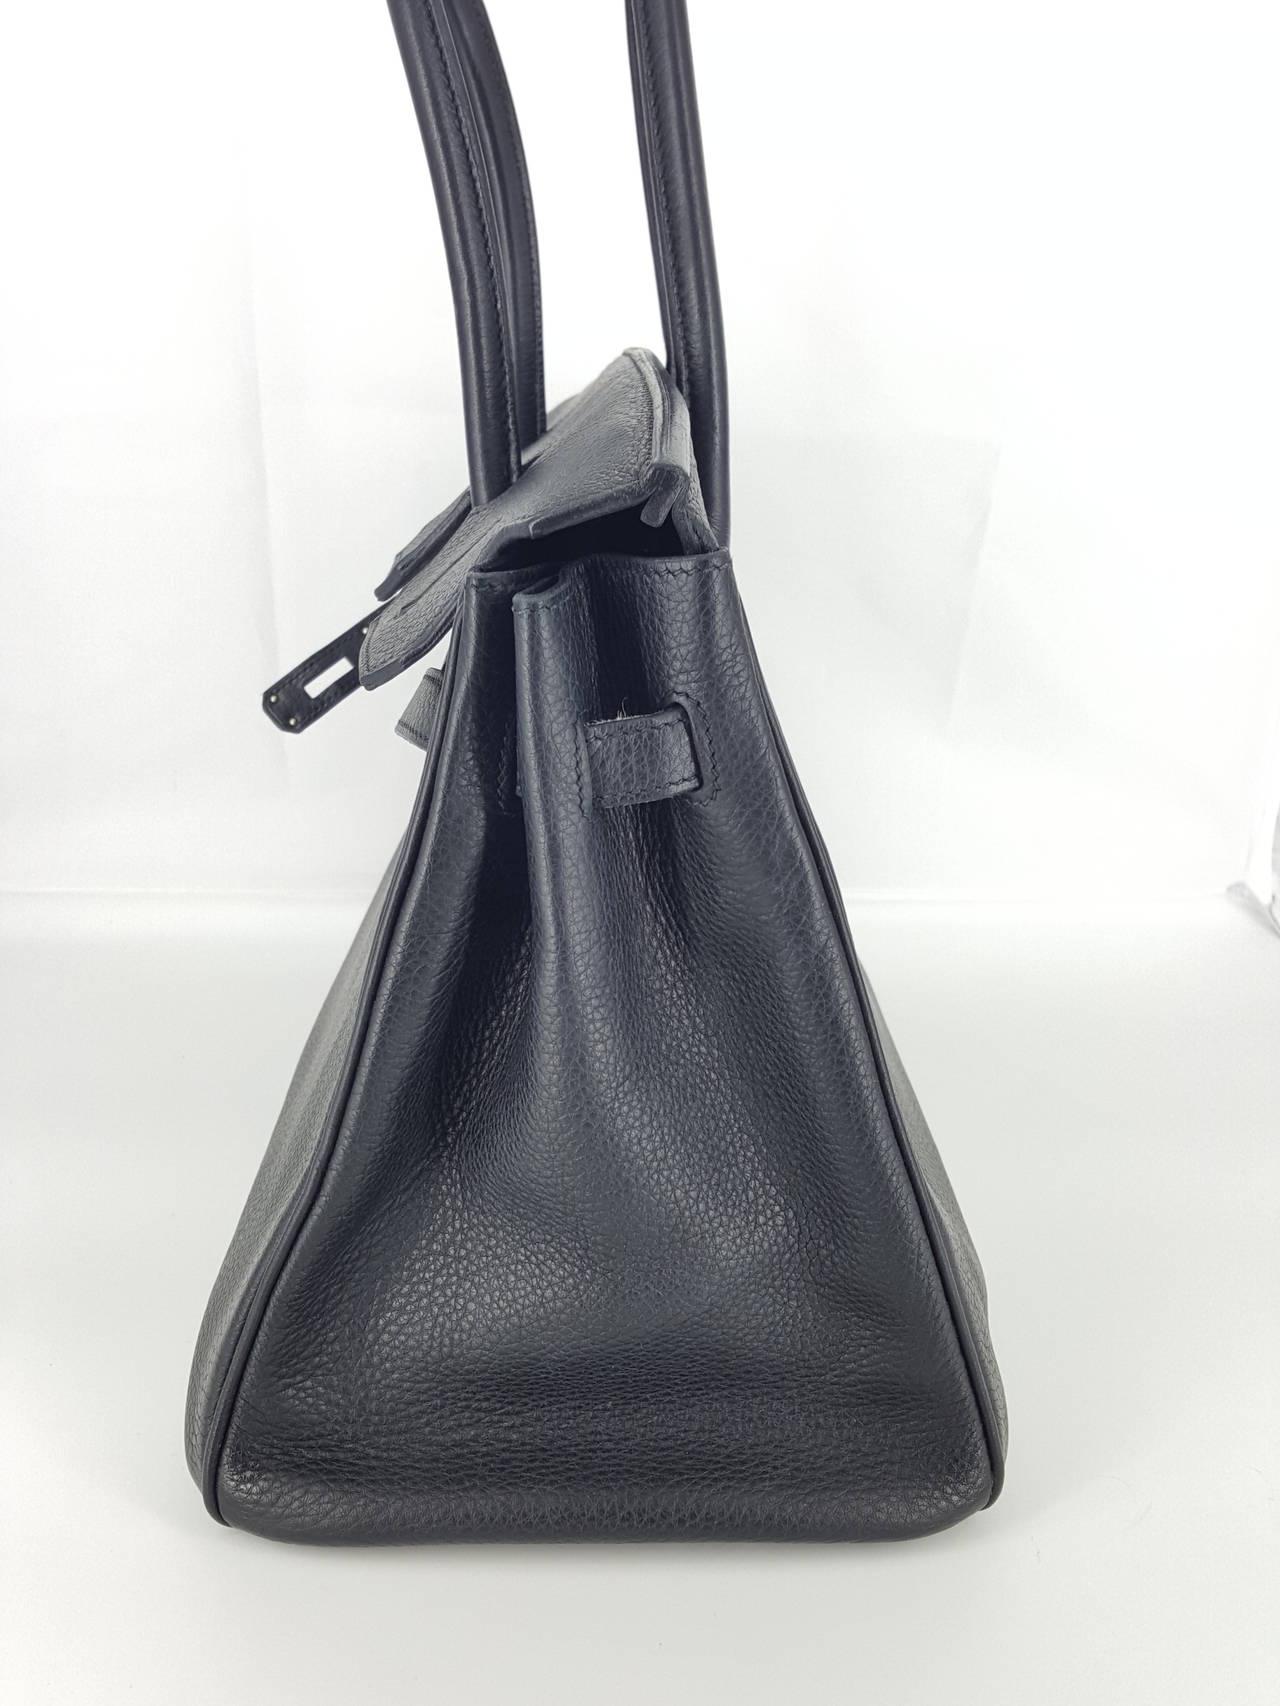 HERMES Birkin 35 CM In Black Clemence Leather With Palladium Hardware. 4